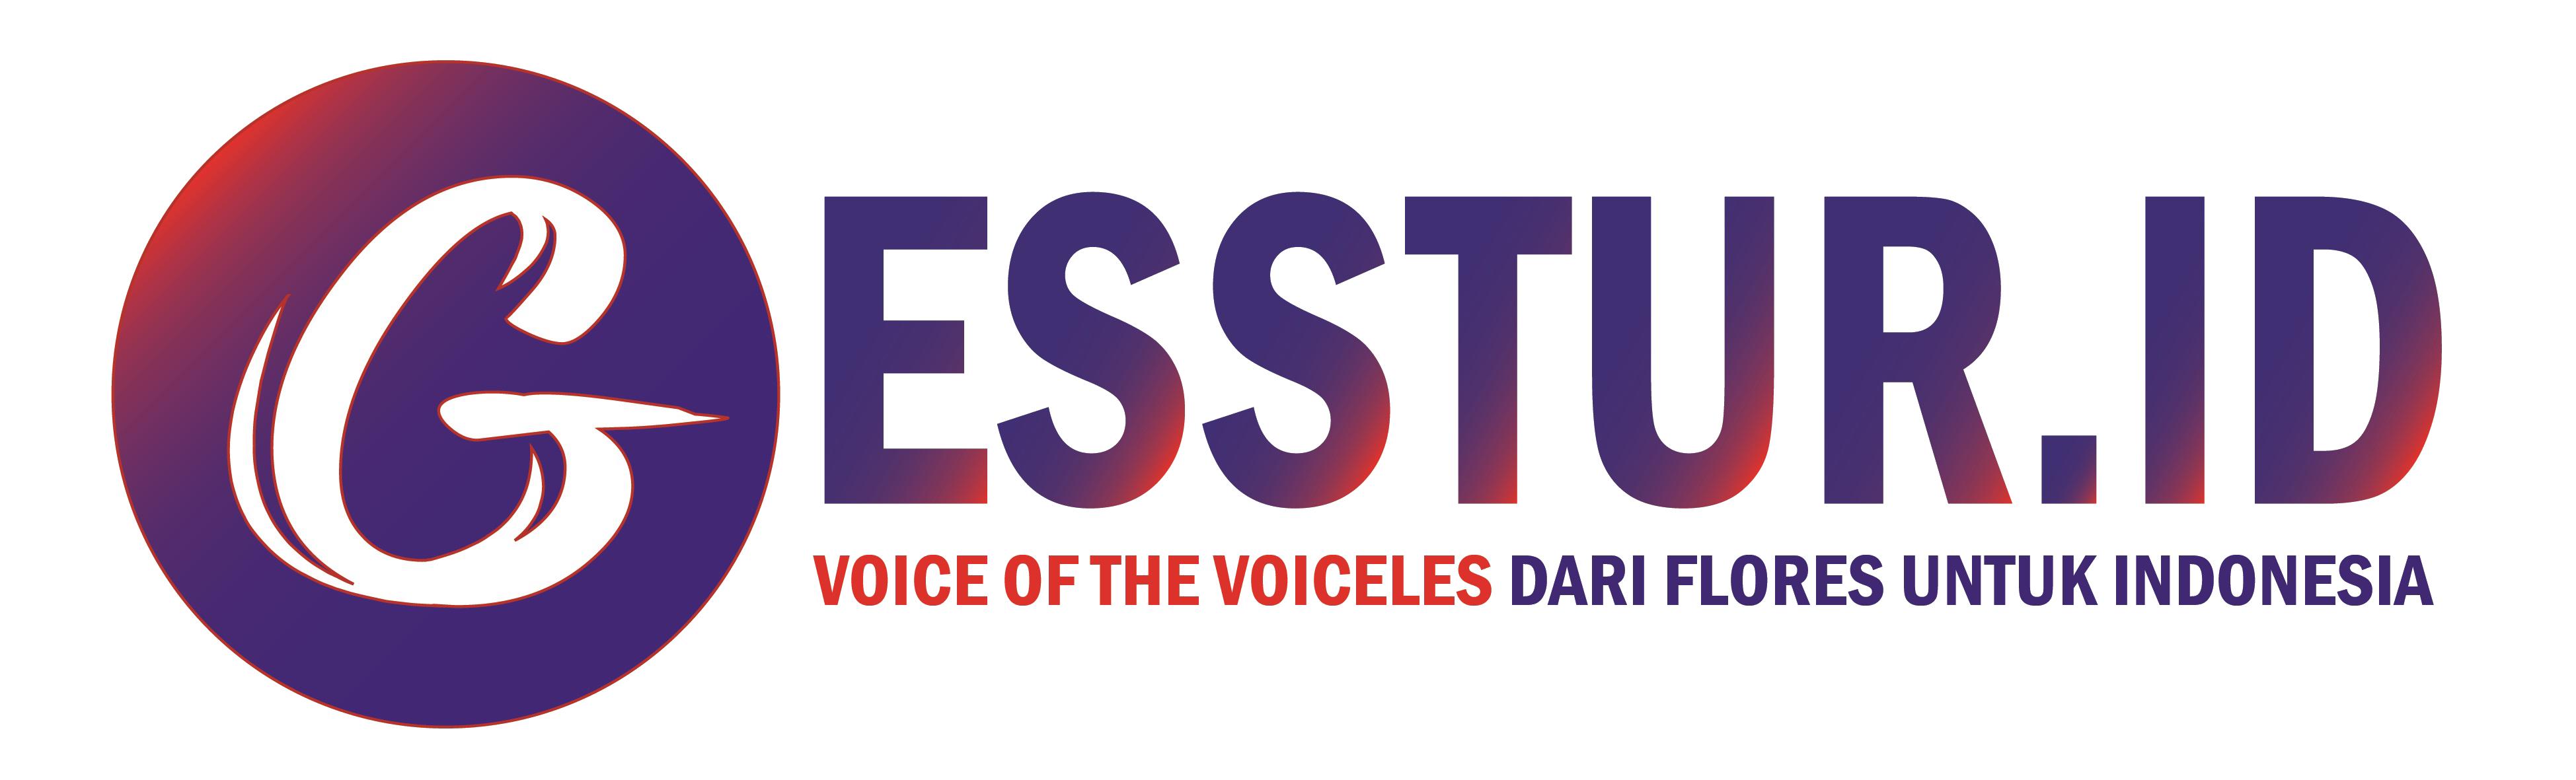 Gesstur.id